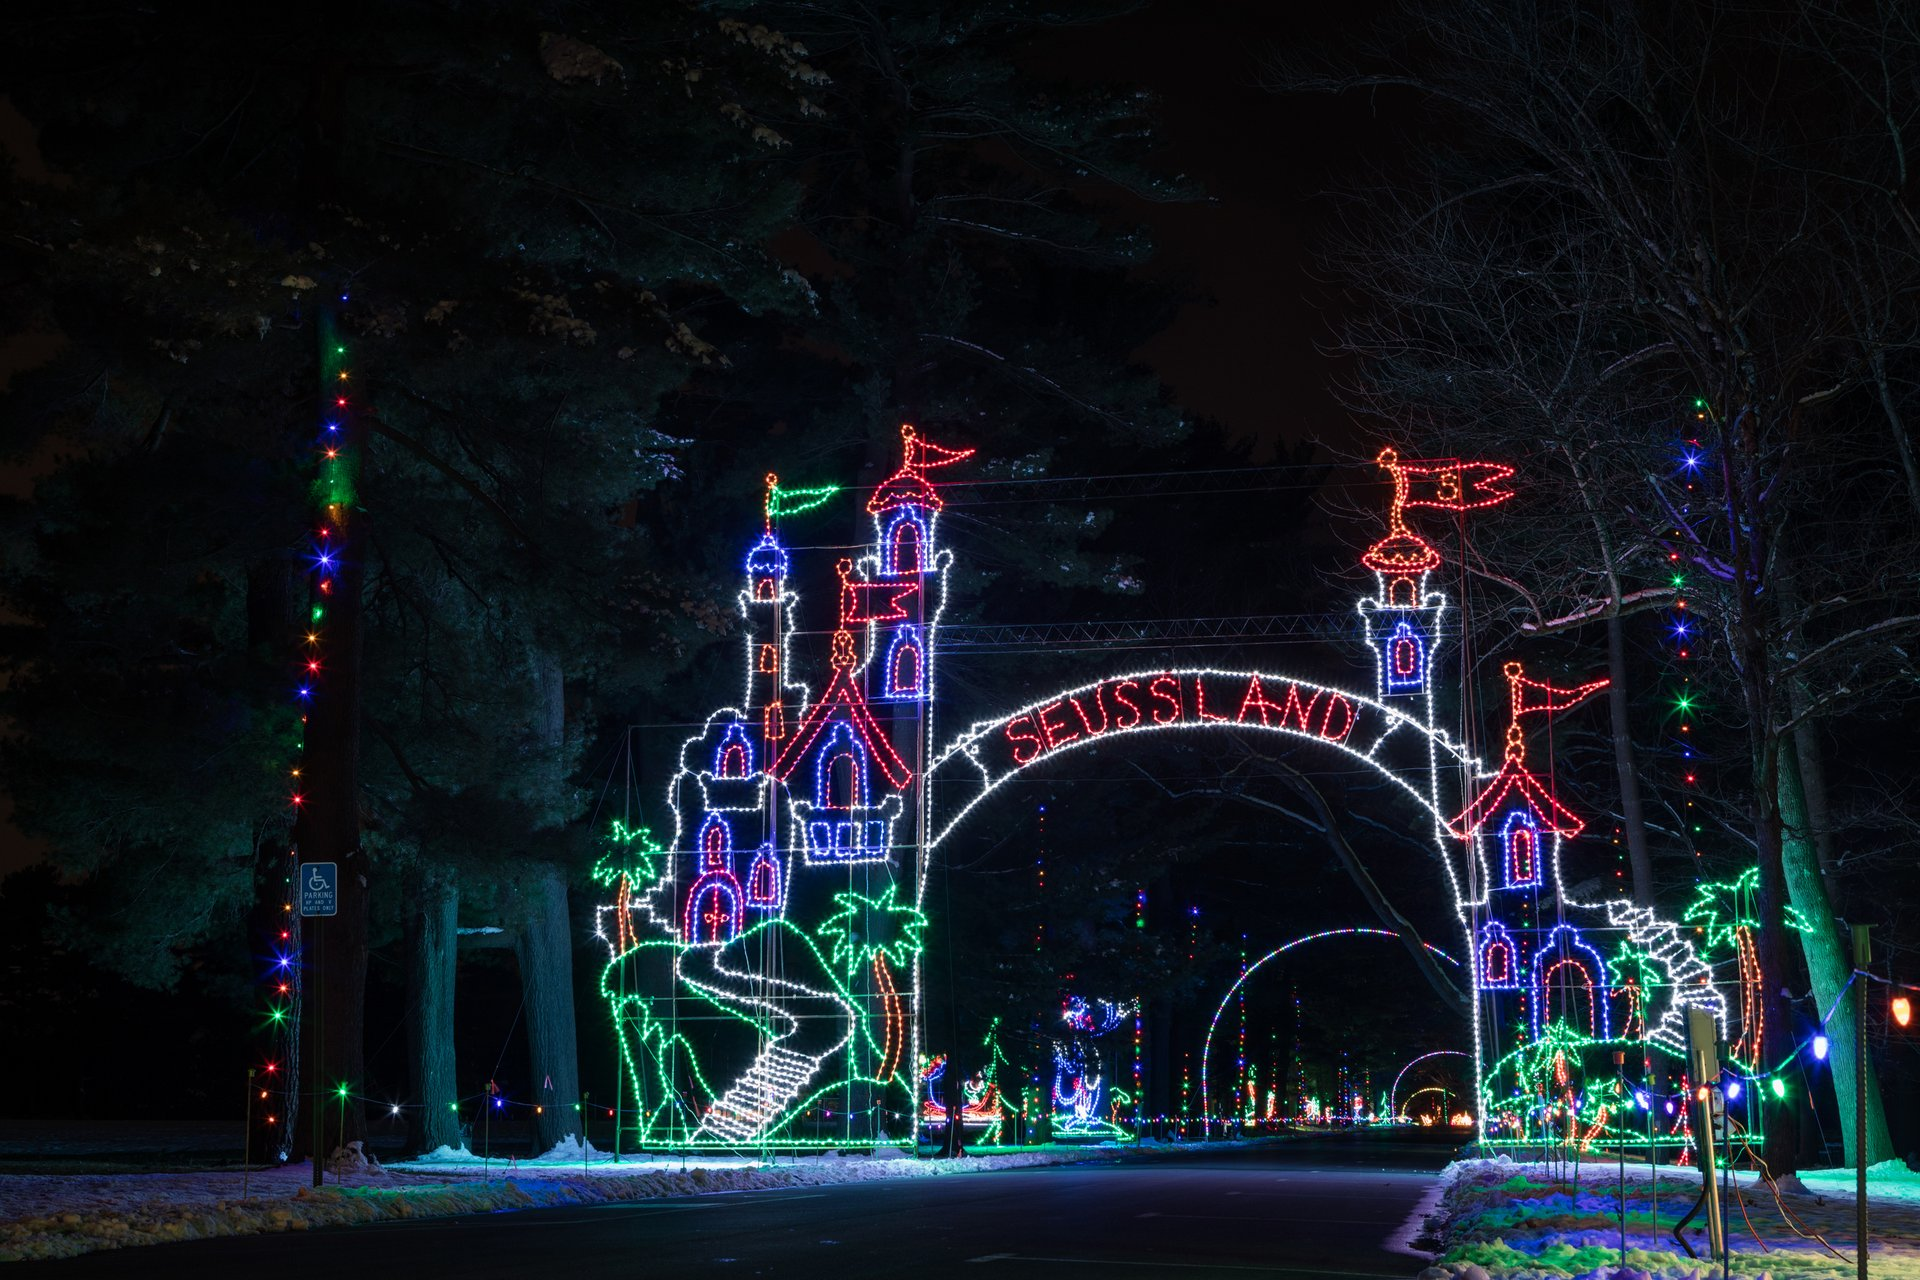 Springfield Mass Christmas Lights 2020 Christmas Lights 2020 2021 in Massachusetts   Dates